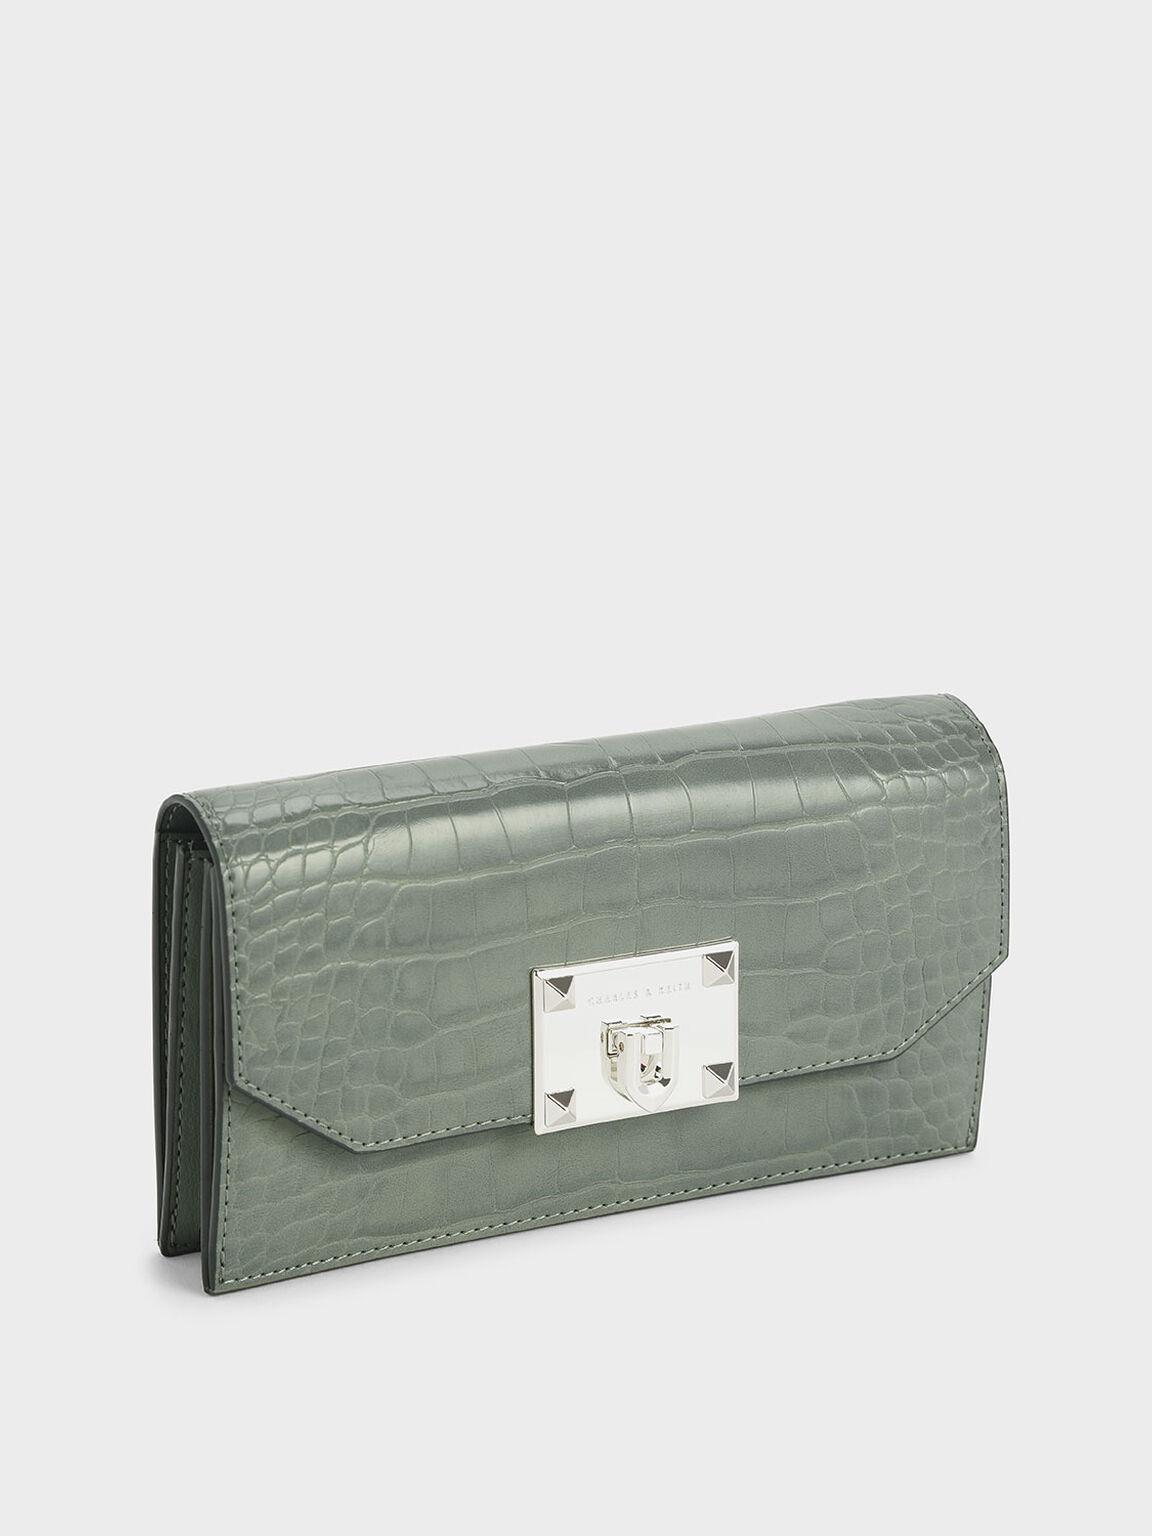 Croc-Effect Push Lock Flap Wallet, Sage Green, hi-res